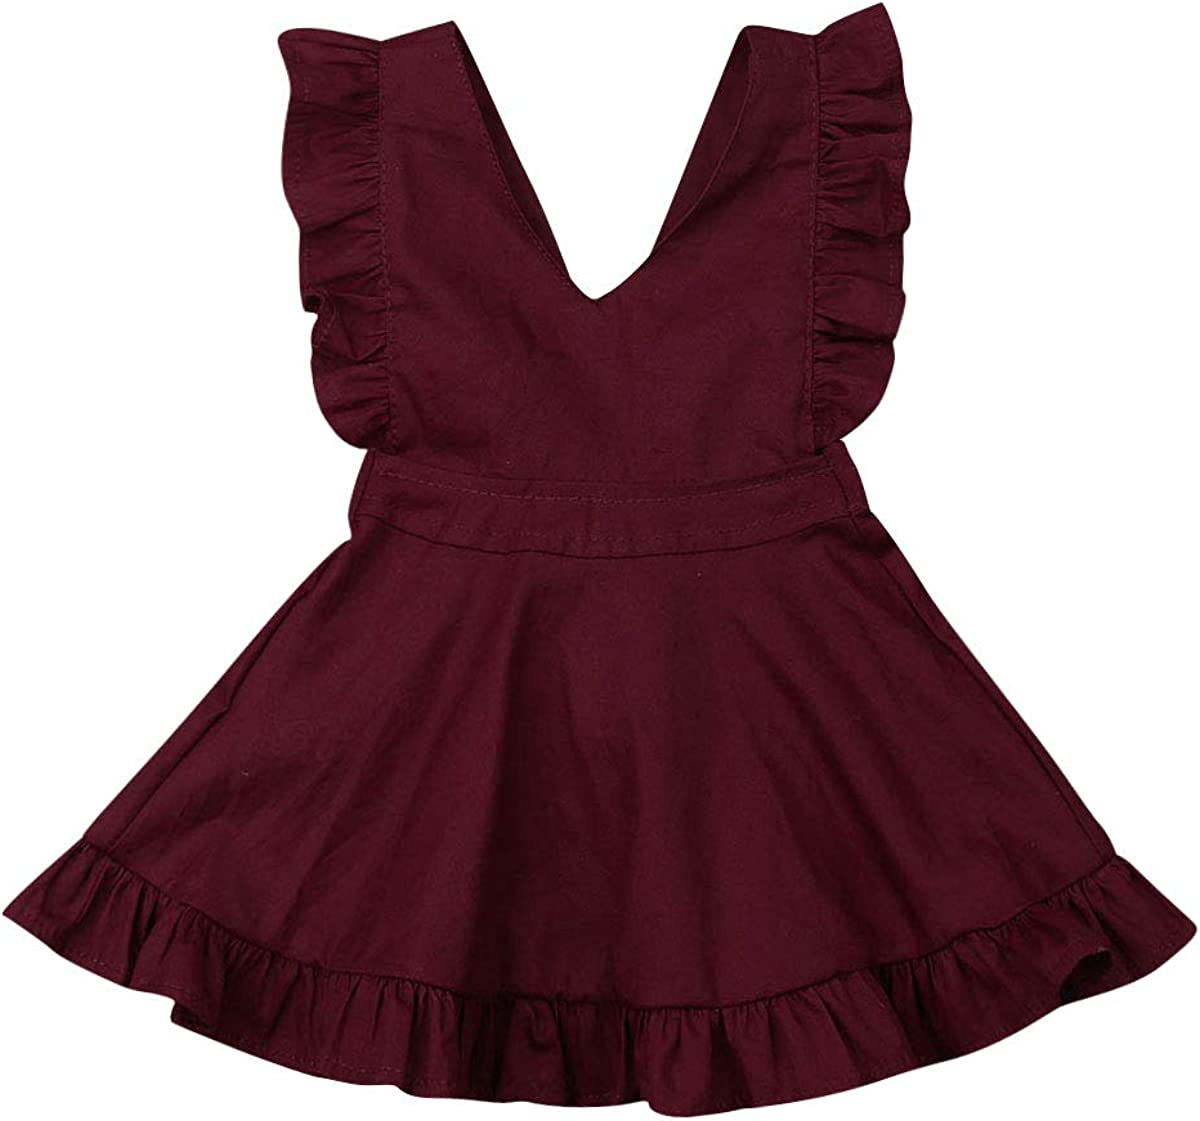 dingshuo Infant Baby Girls Halter Dress Toddler Hawaiian Summer Dress Off-Shoulder Ruffle Shorts Skirt